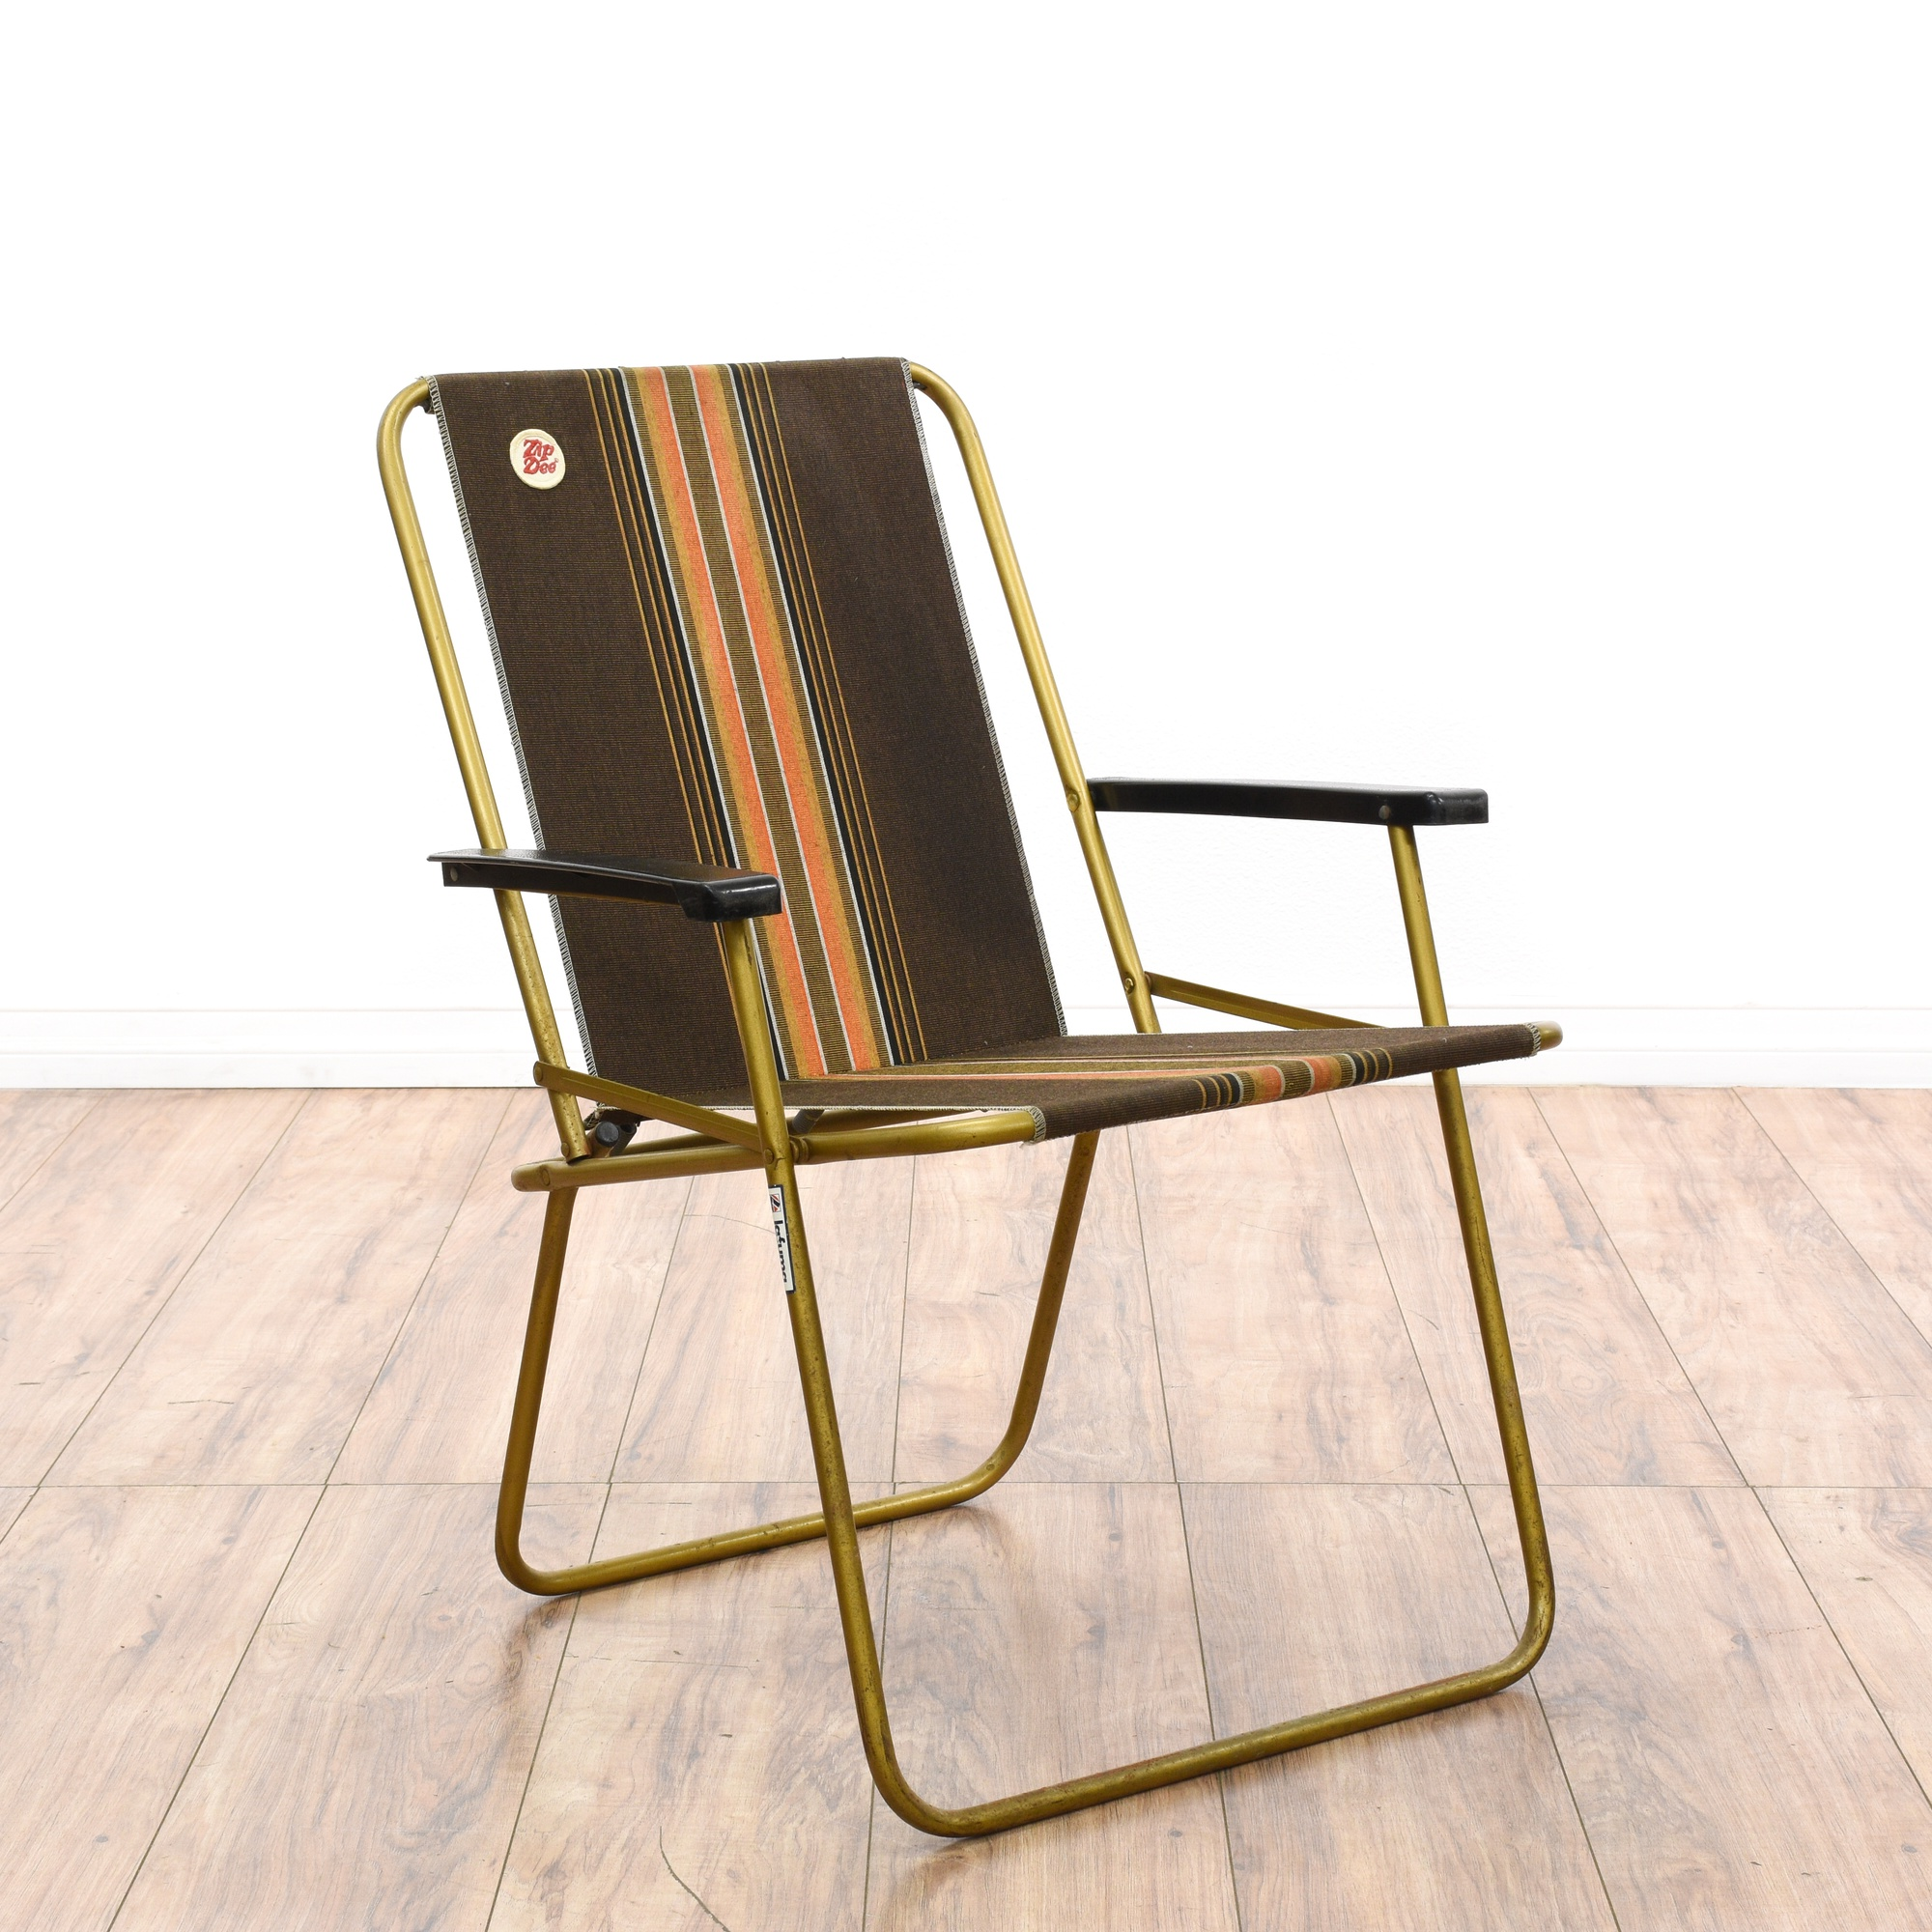 Pair Of 1950s Aluminum Folding Beach Chairs Loveseat